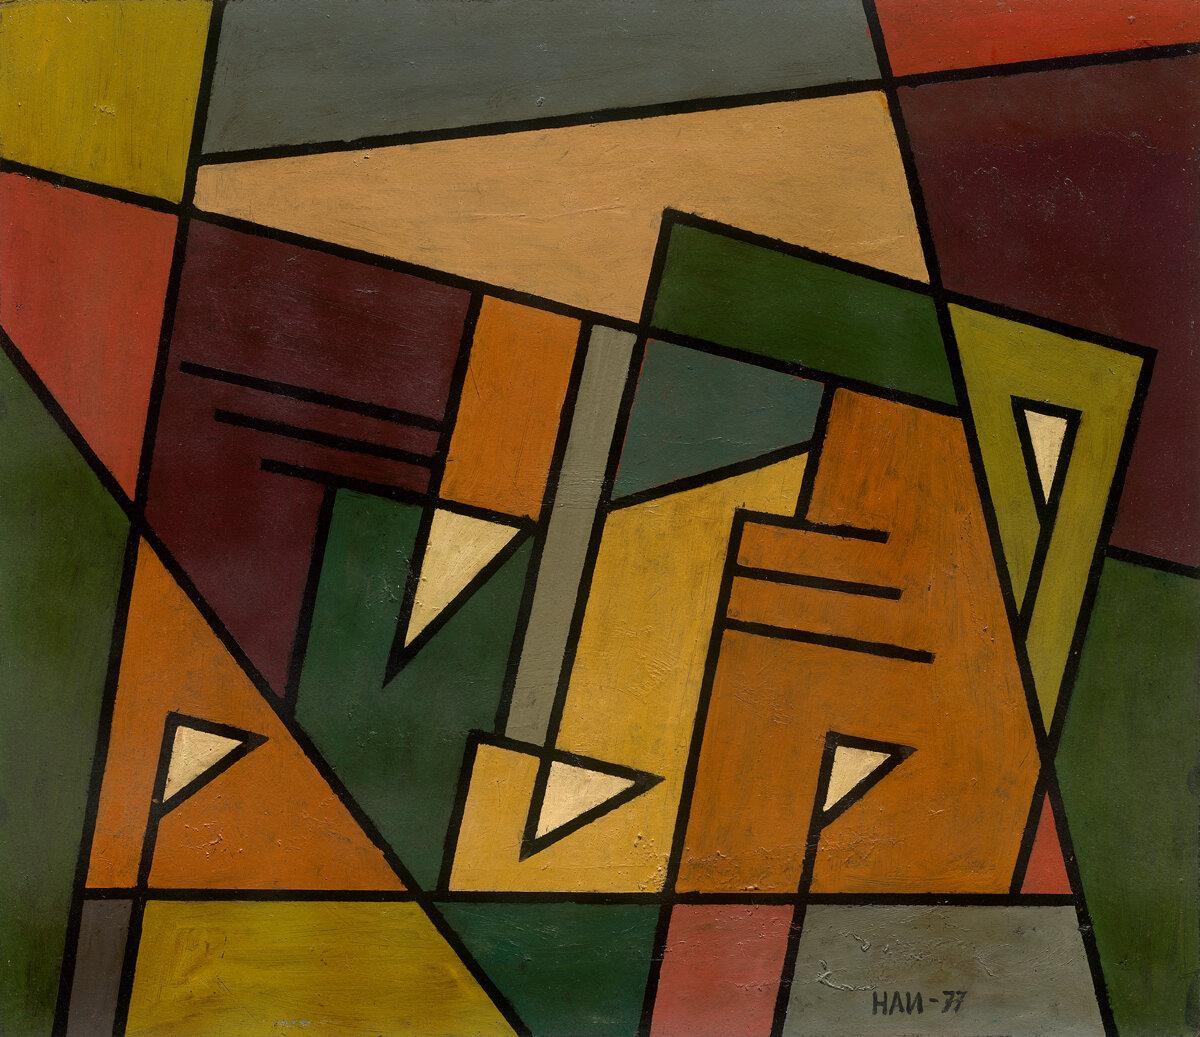 Handrio, Dinamika Ruang (Space Dynamics), 1977, 54.5 x 63.5 cm